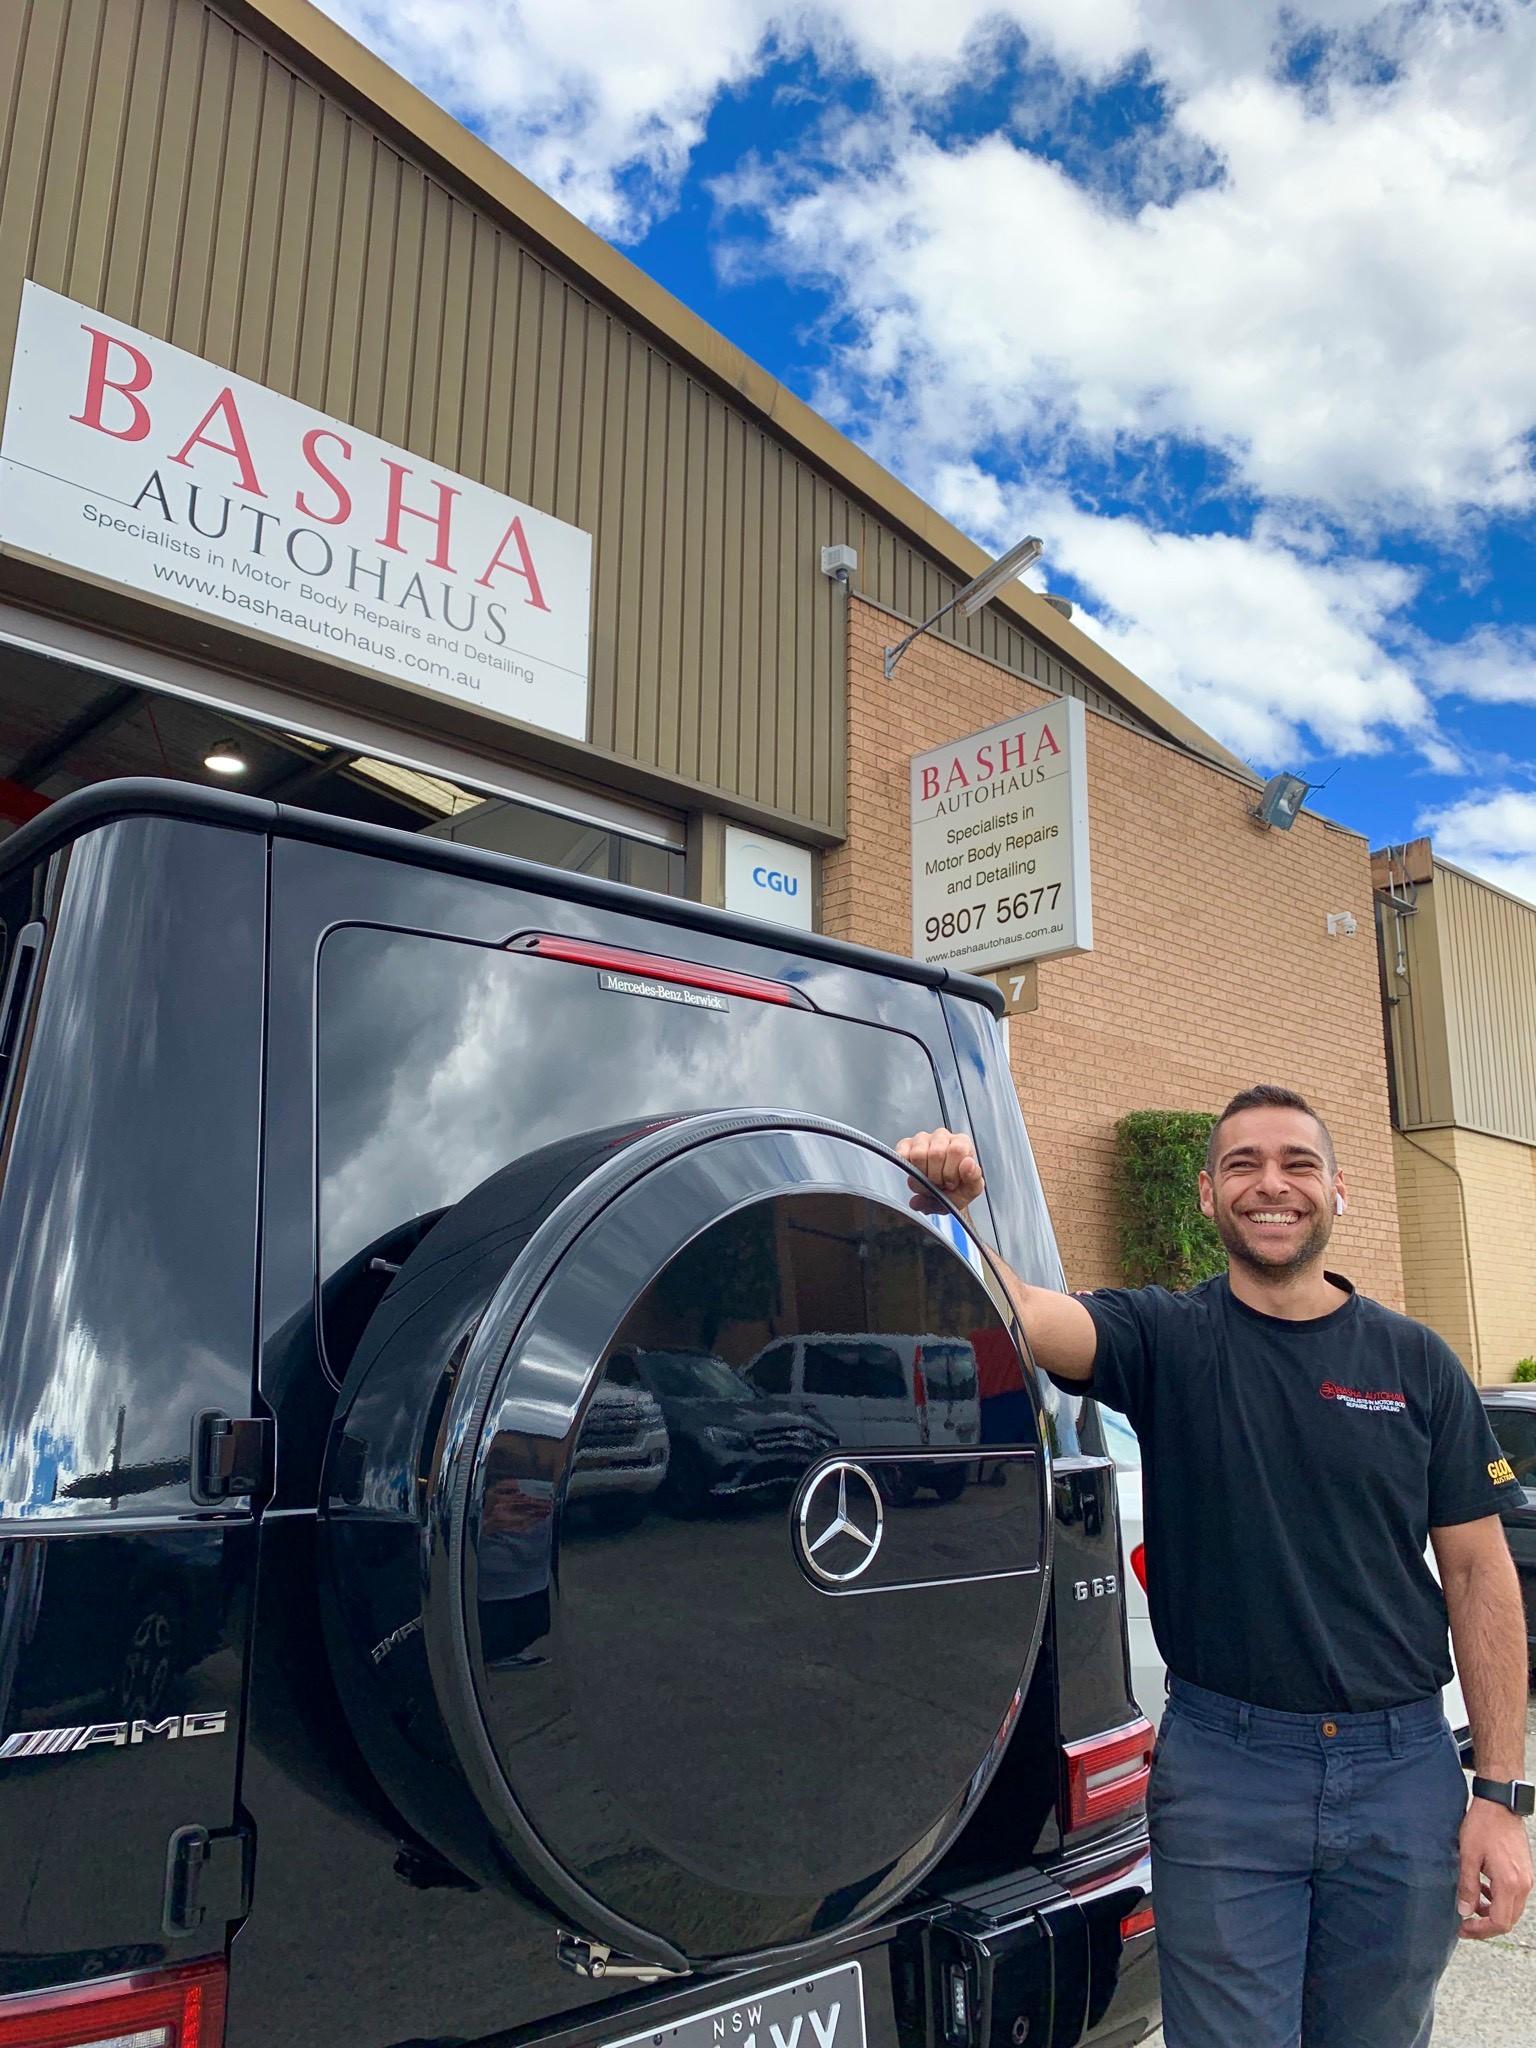 Basha Autohaus Photos